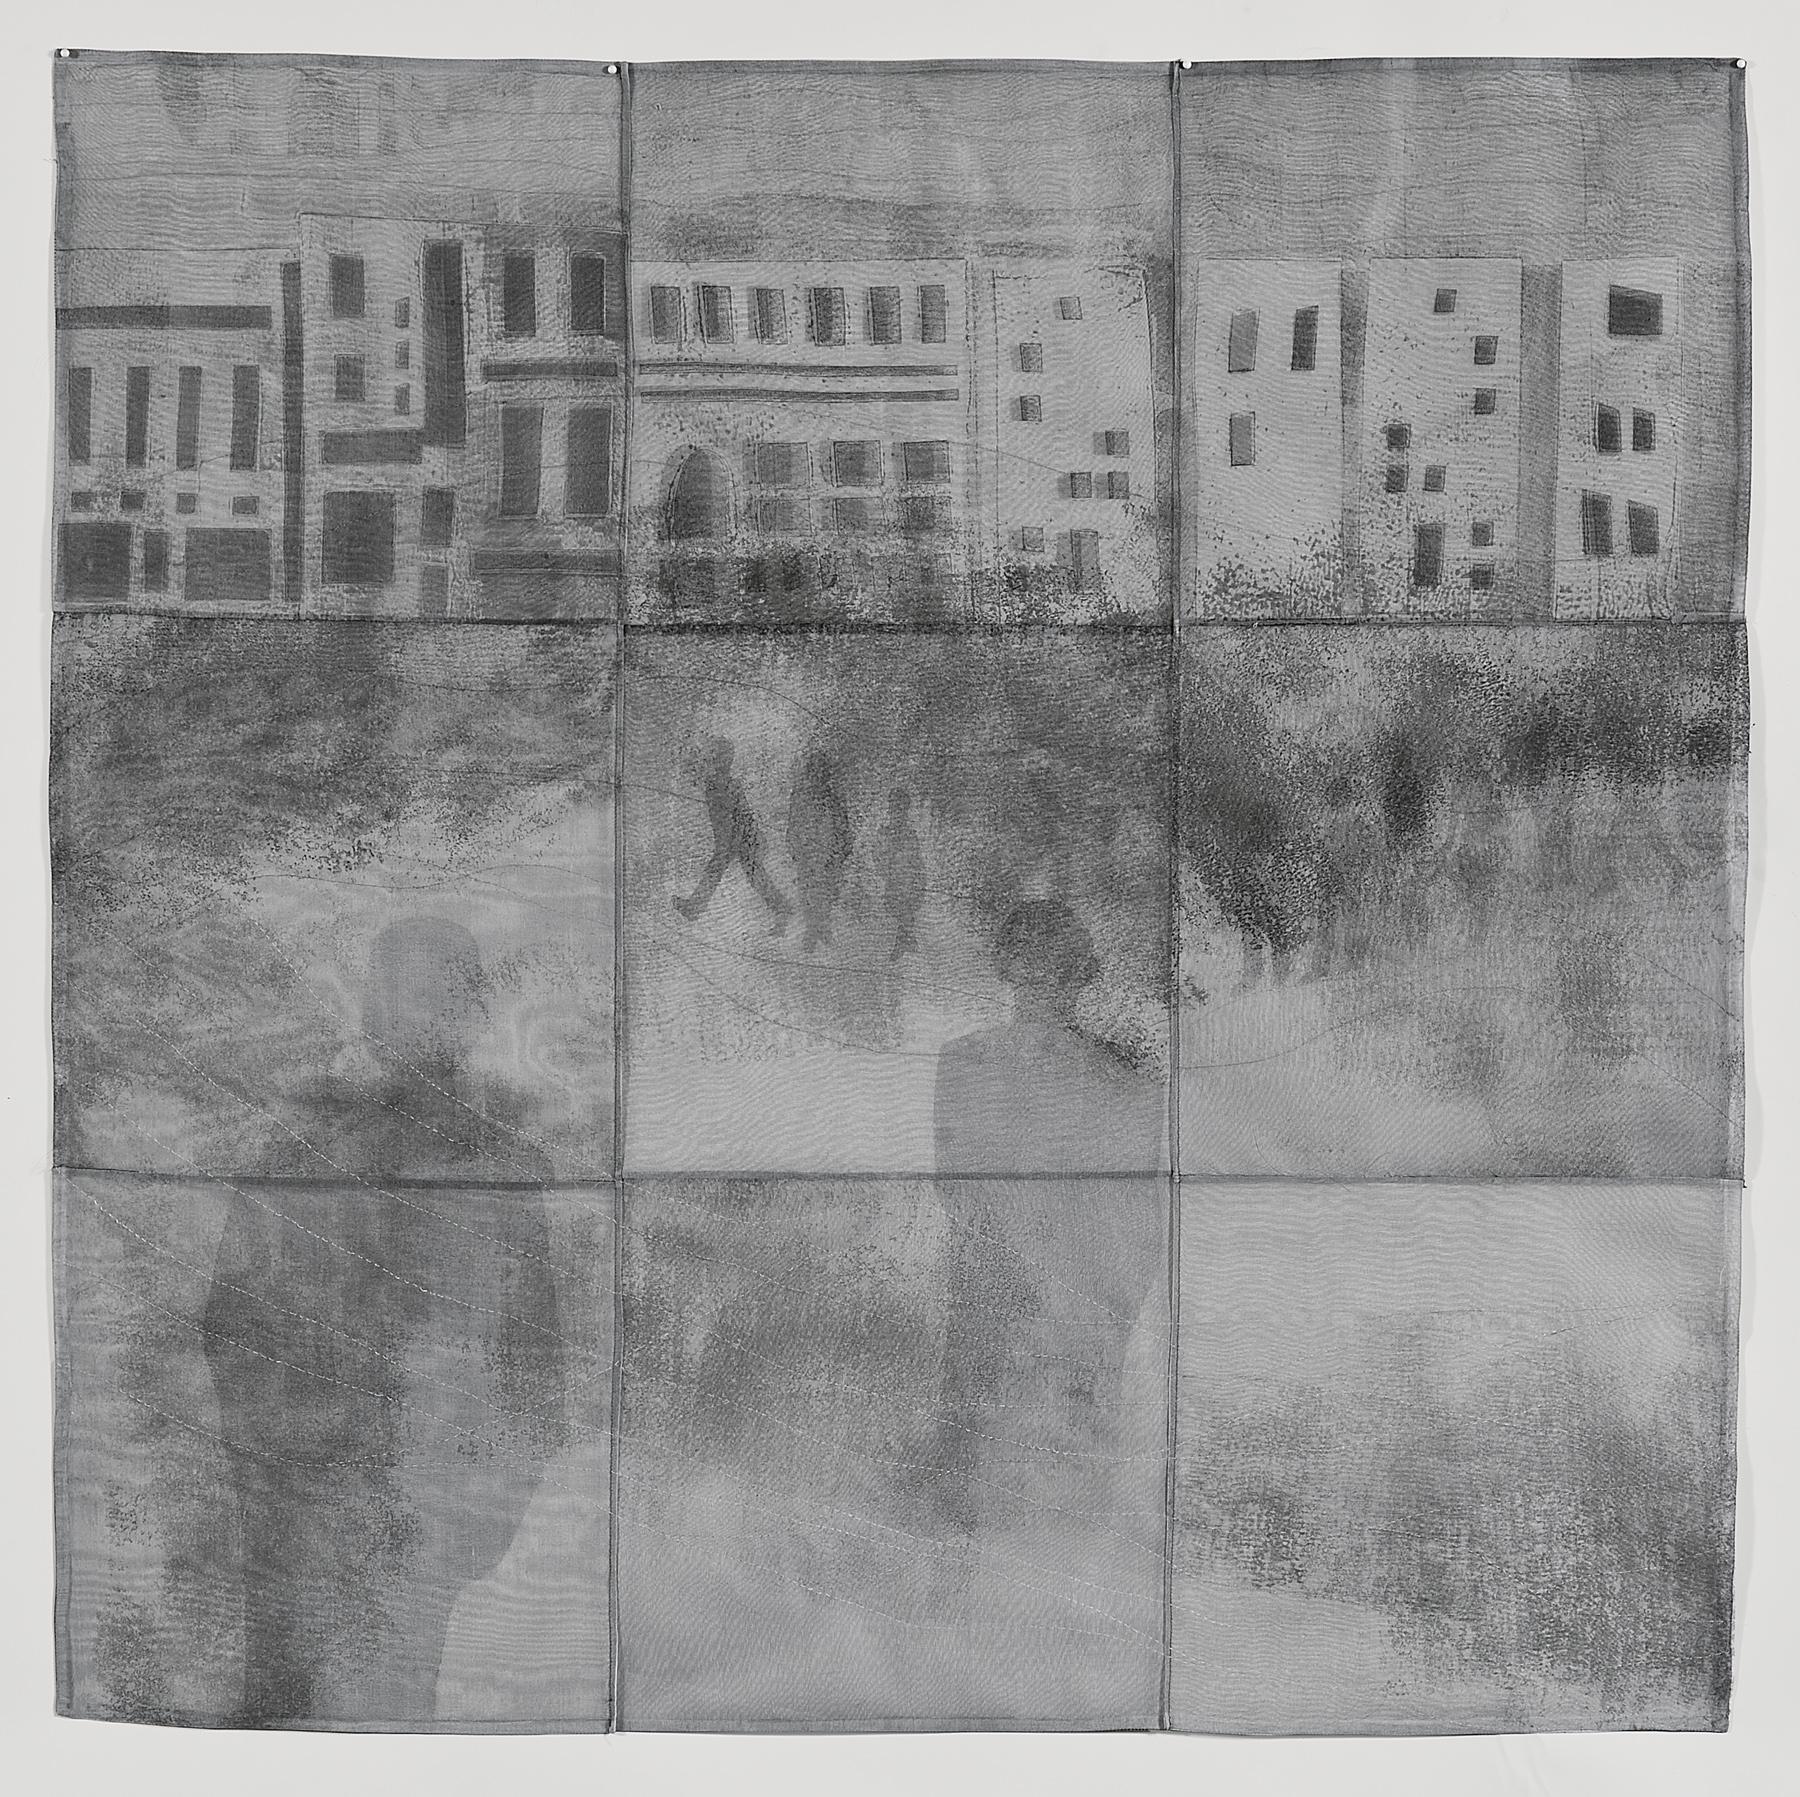 Quilt by Nancy Crasco